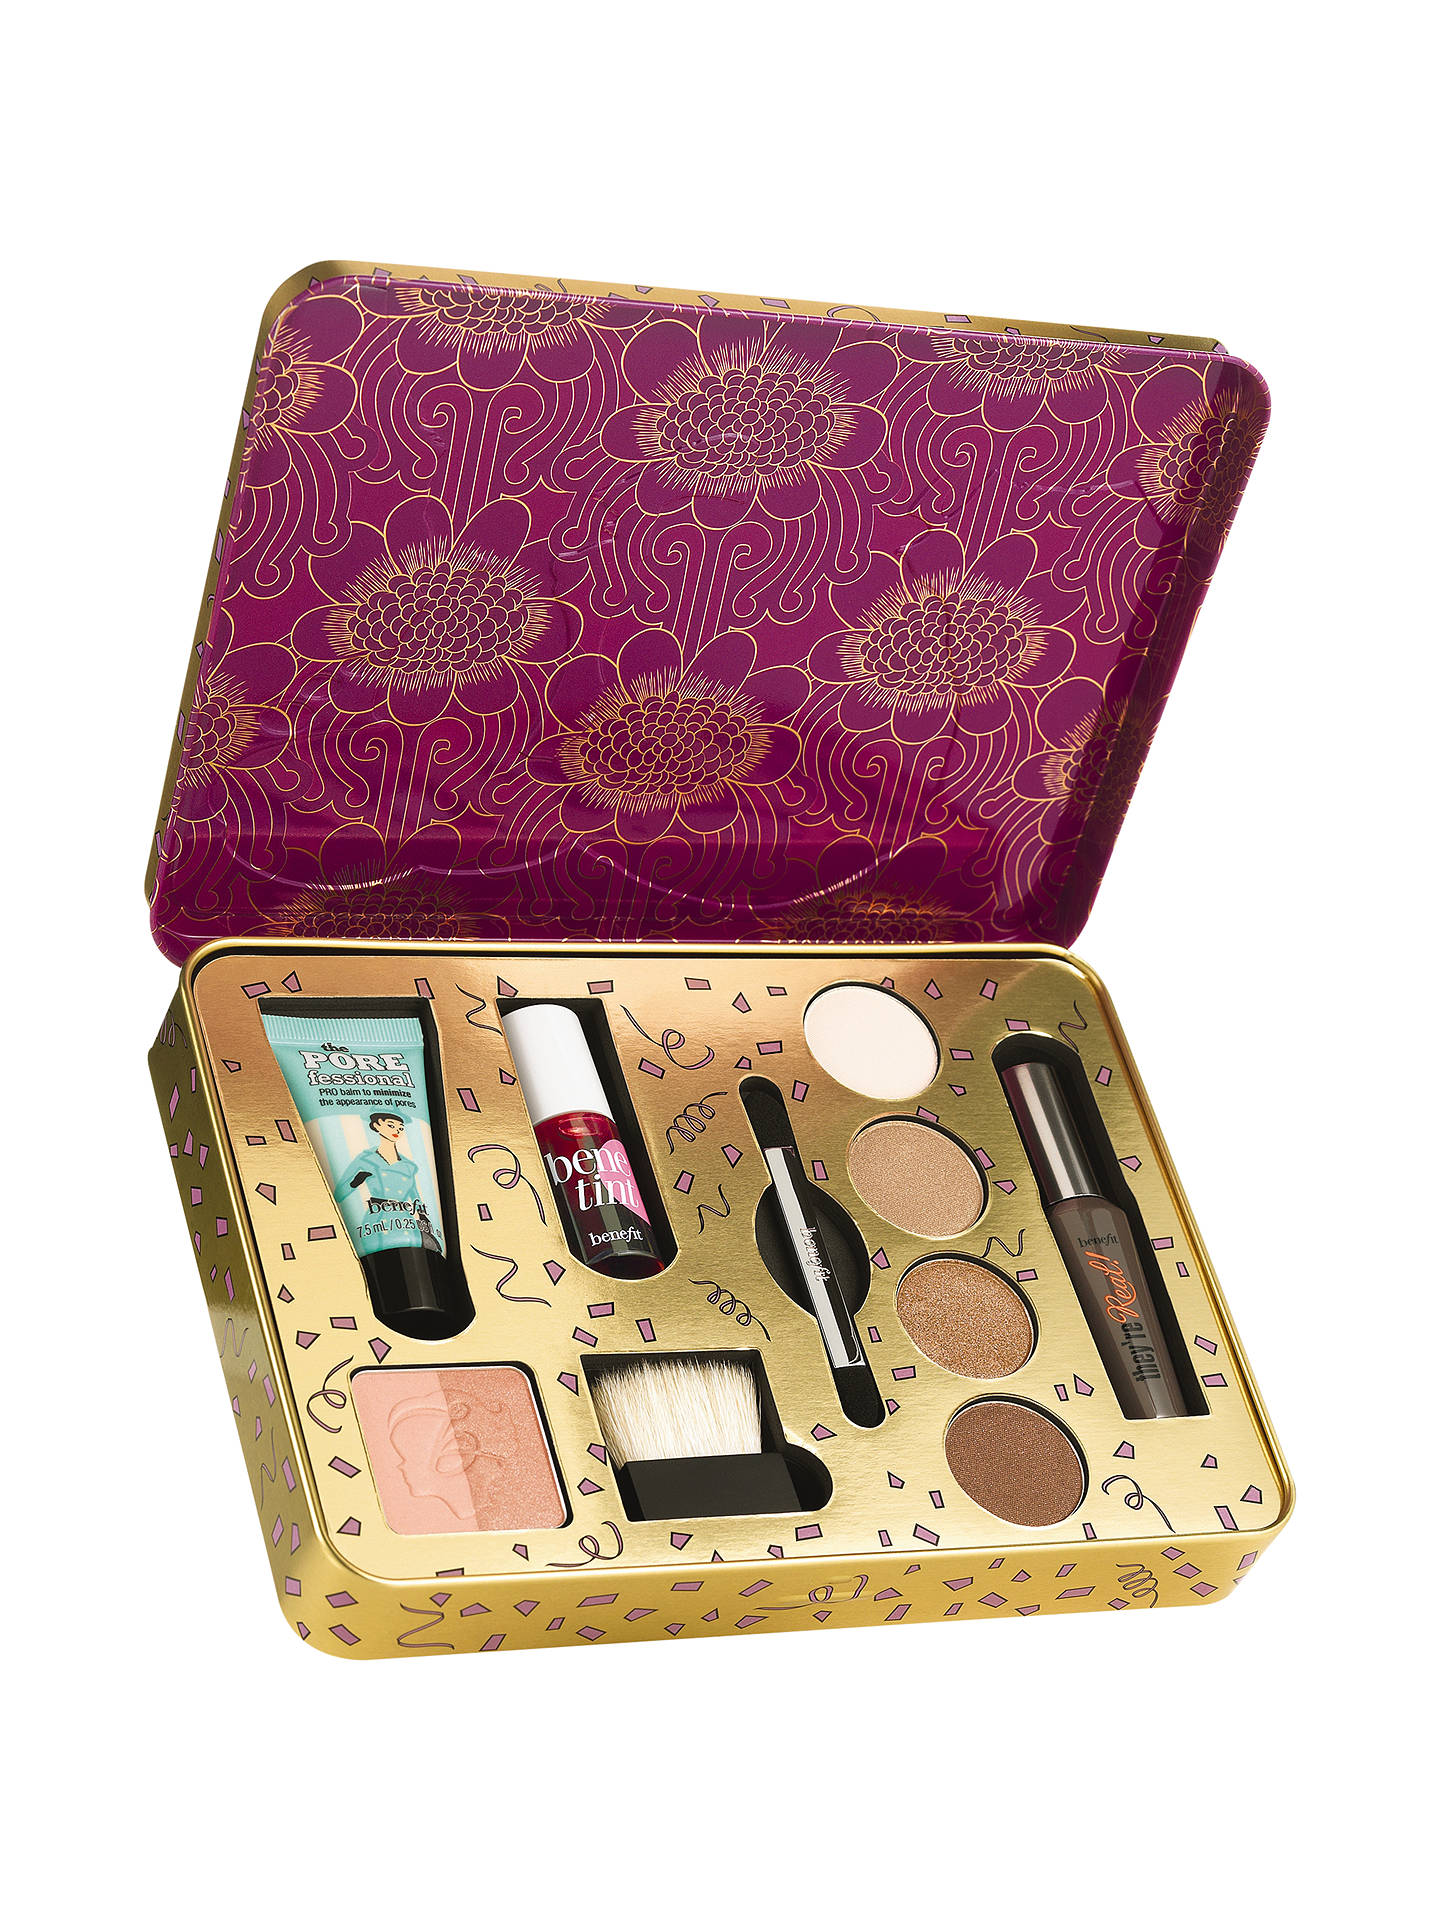 Benefit Groovy Kind-a-Luv Makeup Box Set